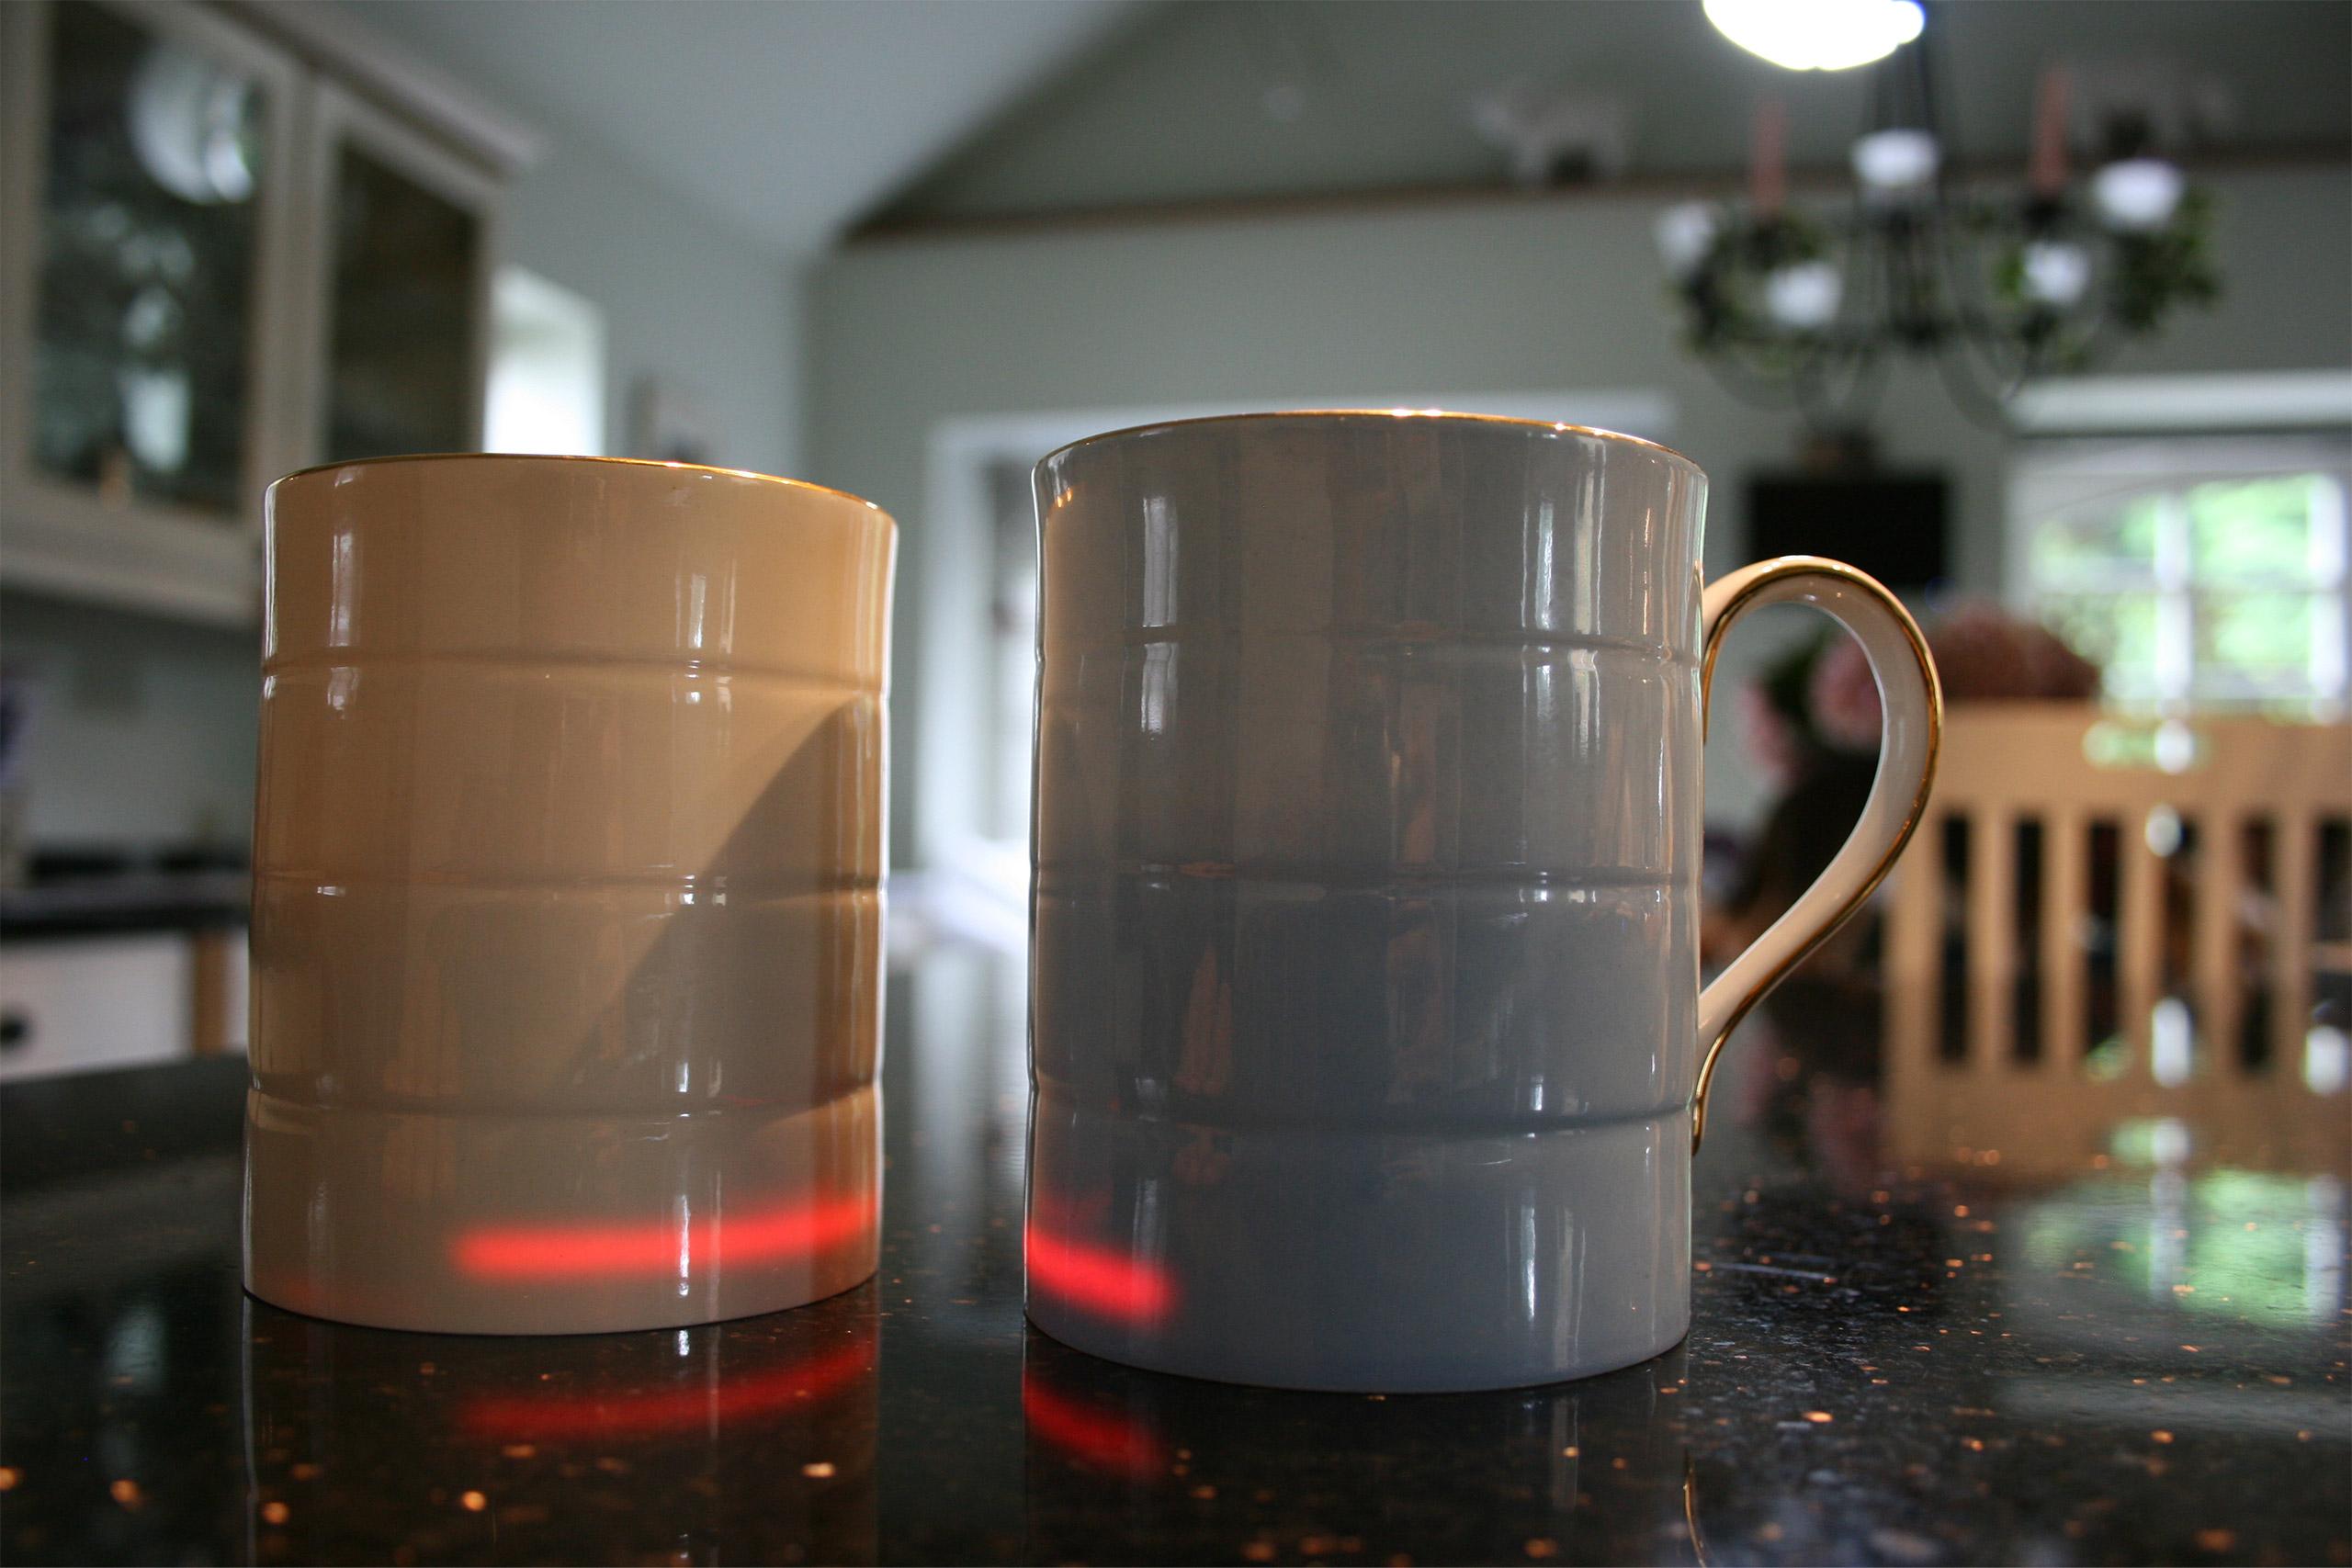 glowstone-heated-smart-mug-fine-bone-china-mug-lightbar-1